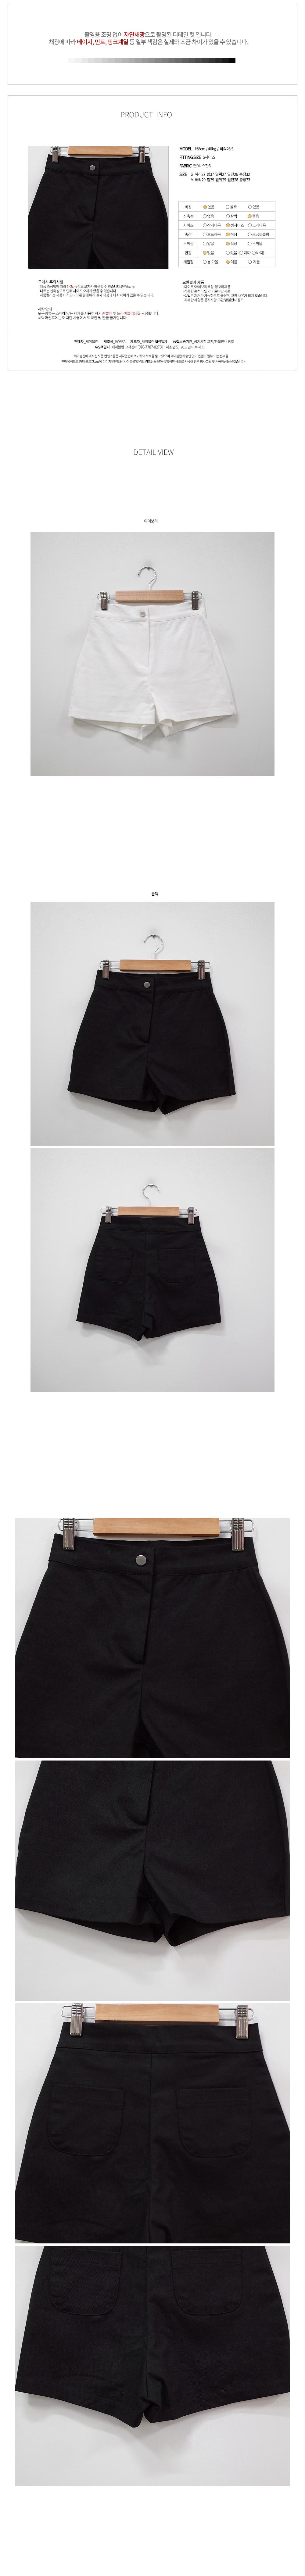 This Basic Short Pants + Fitz Button Short Sleeve Knitwear